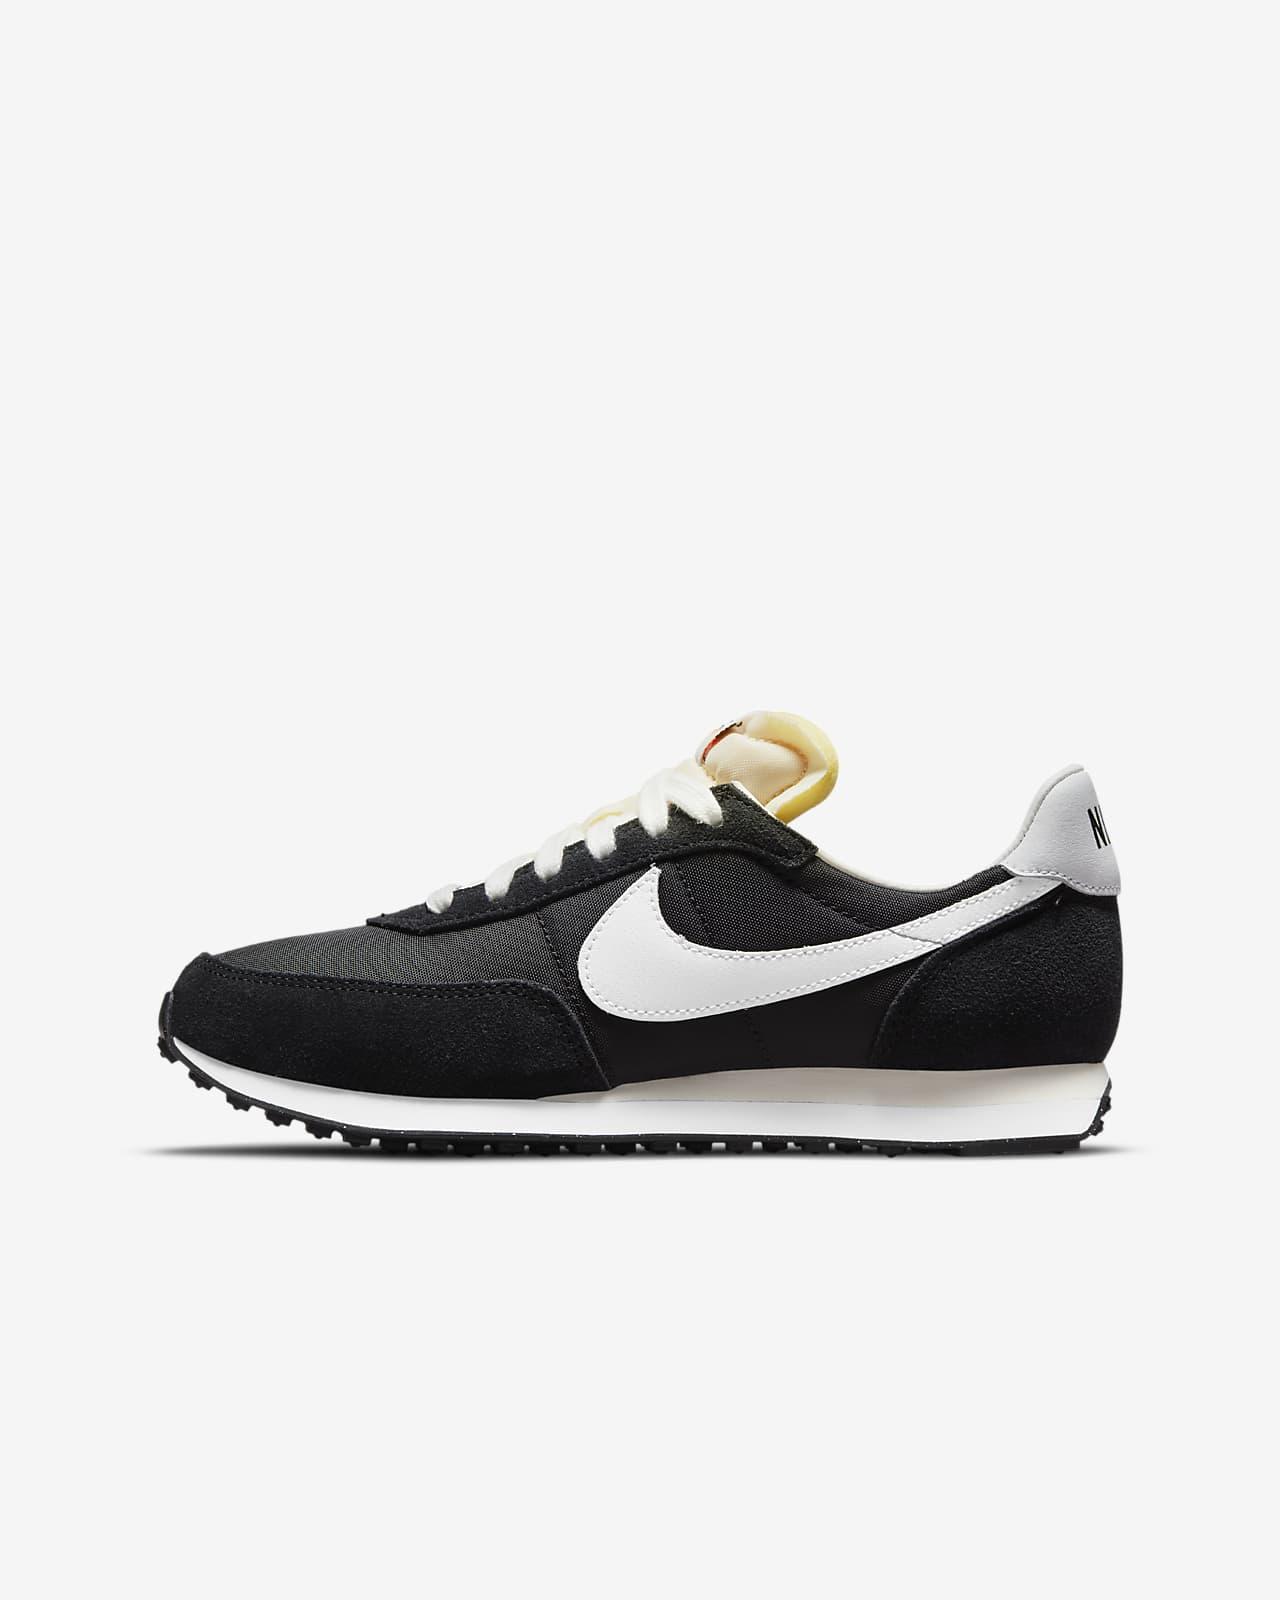 Nike Waffle Trainer 2 Older Kids' Shoes